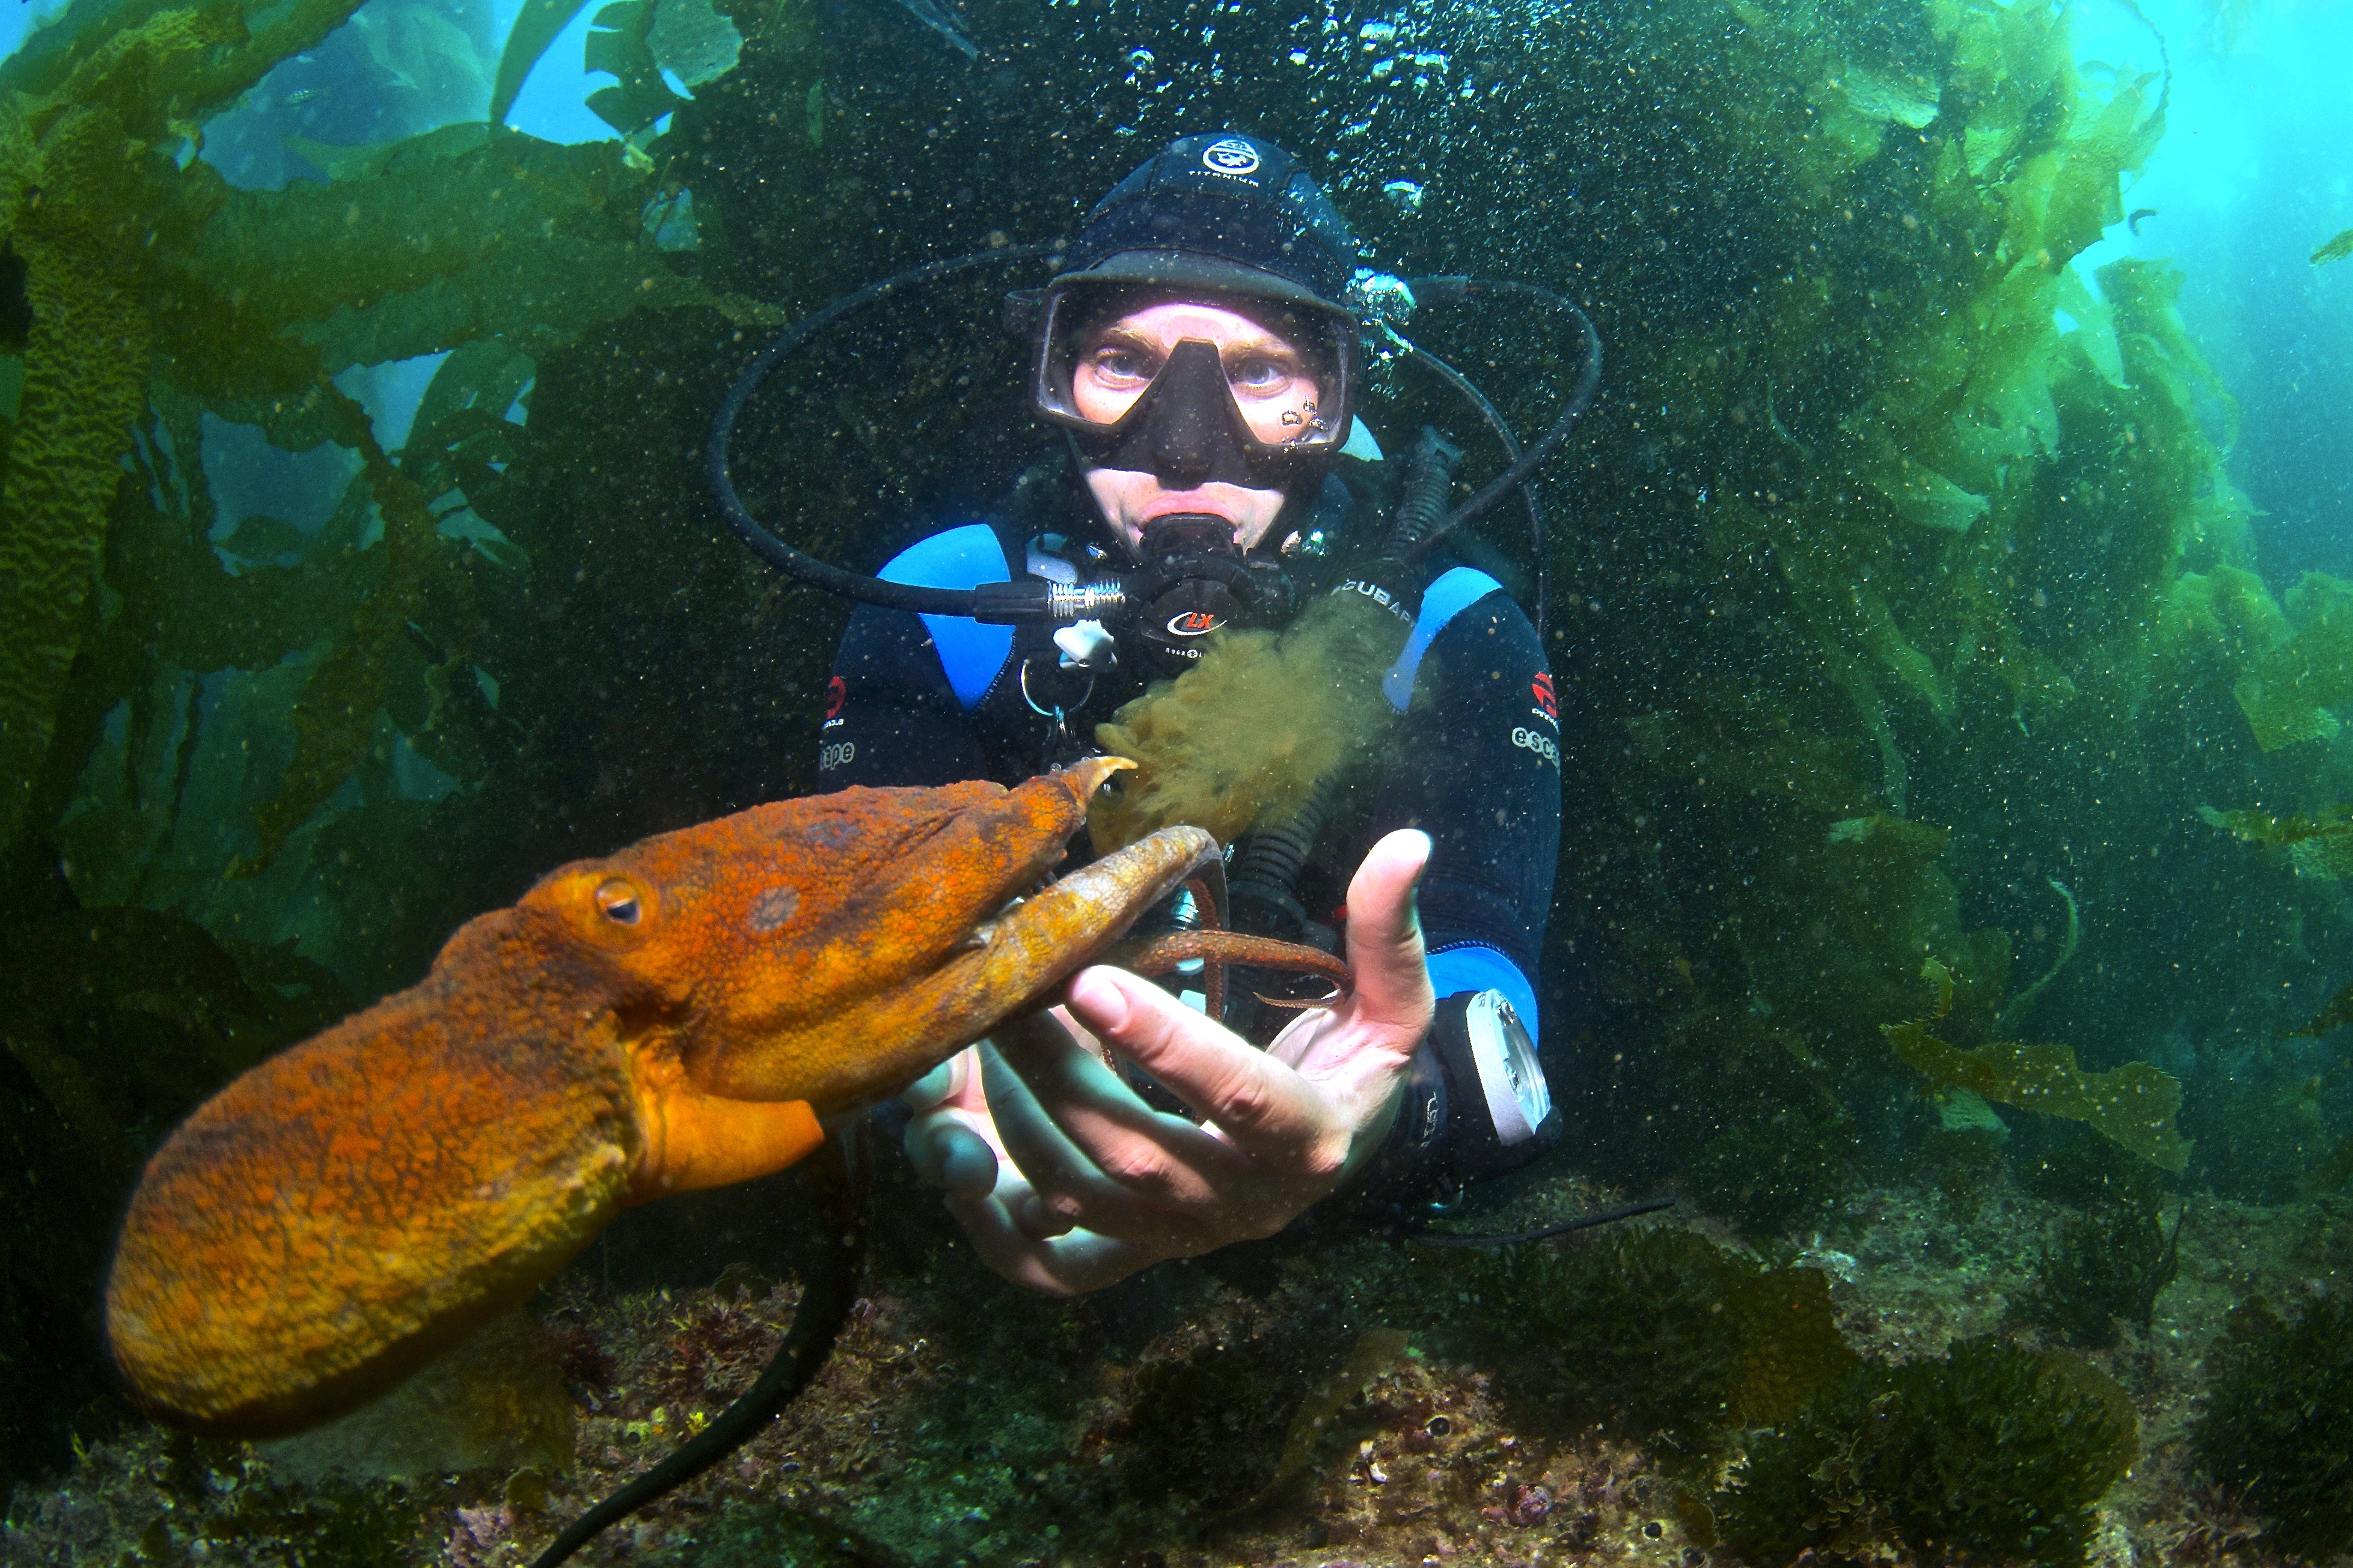 Marine scientist Jenny Hofmeister, Ph.D. studies Octopus behavior and ecology.